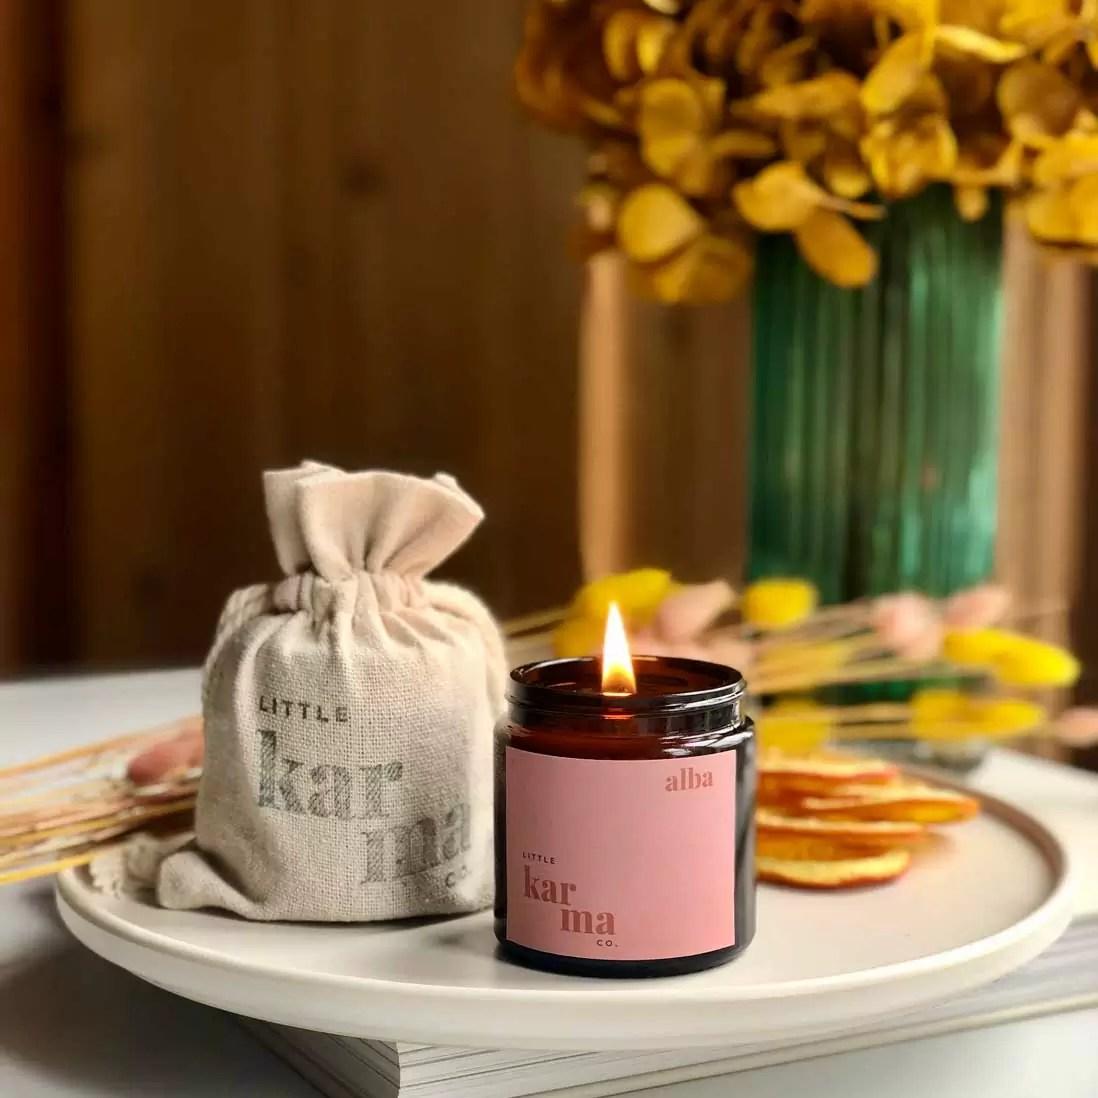 alba | balancing bergamot + rose geranium mini candle [90g]